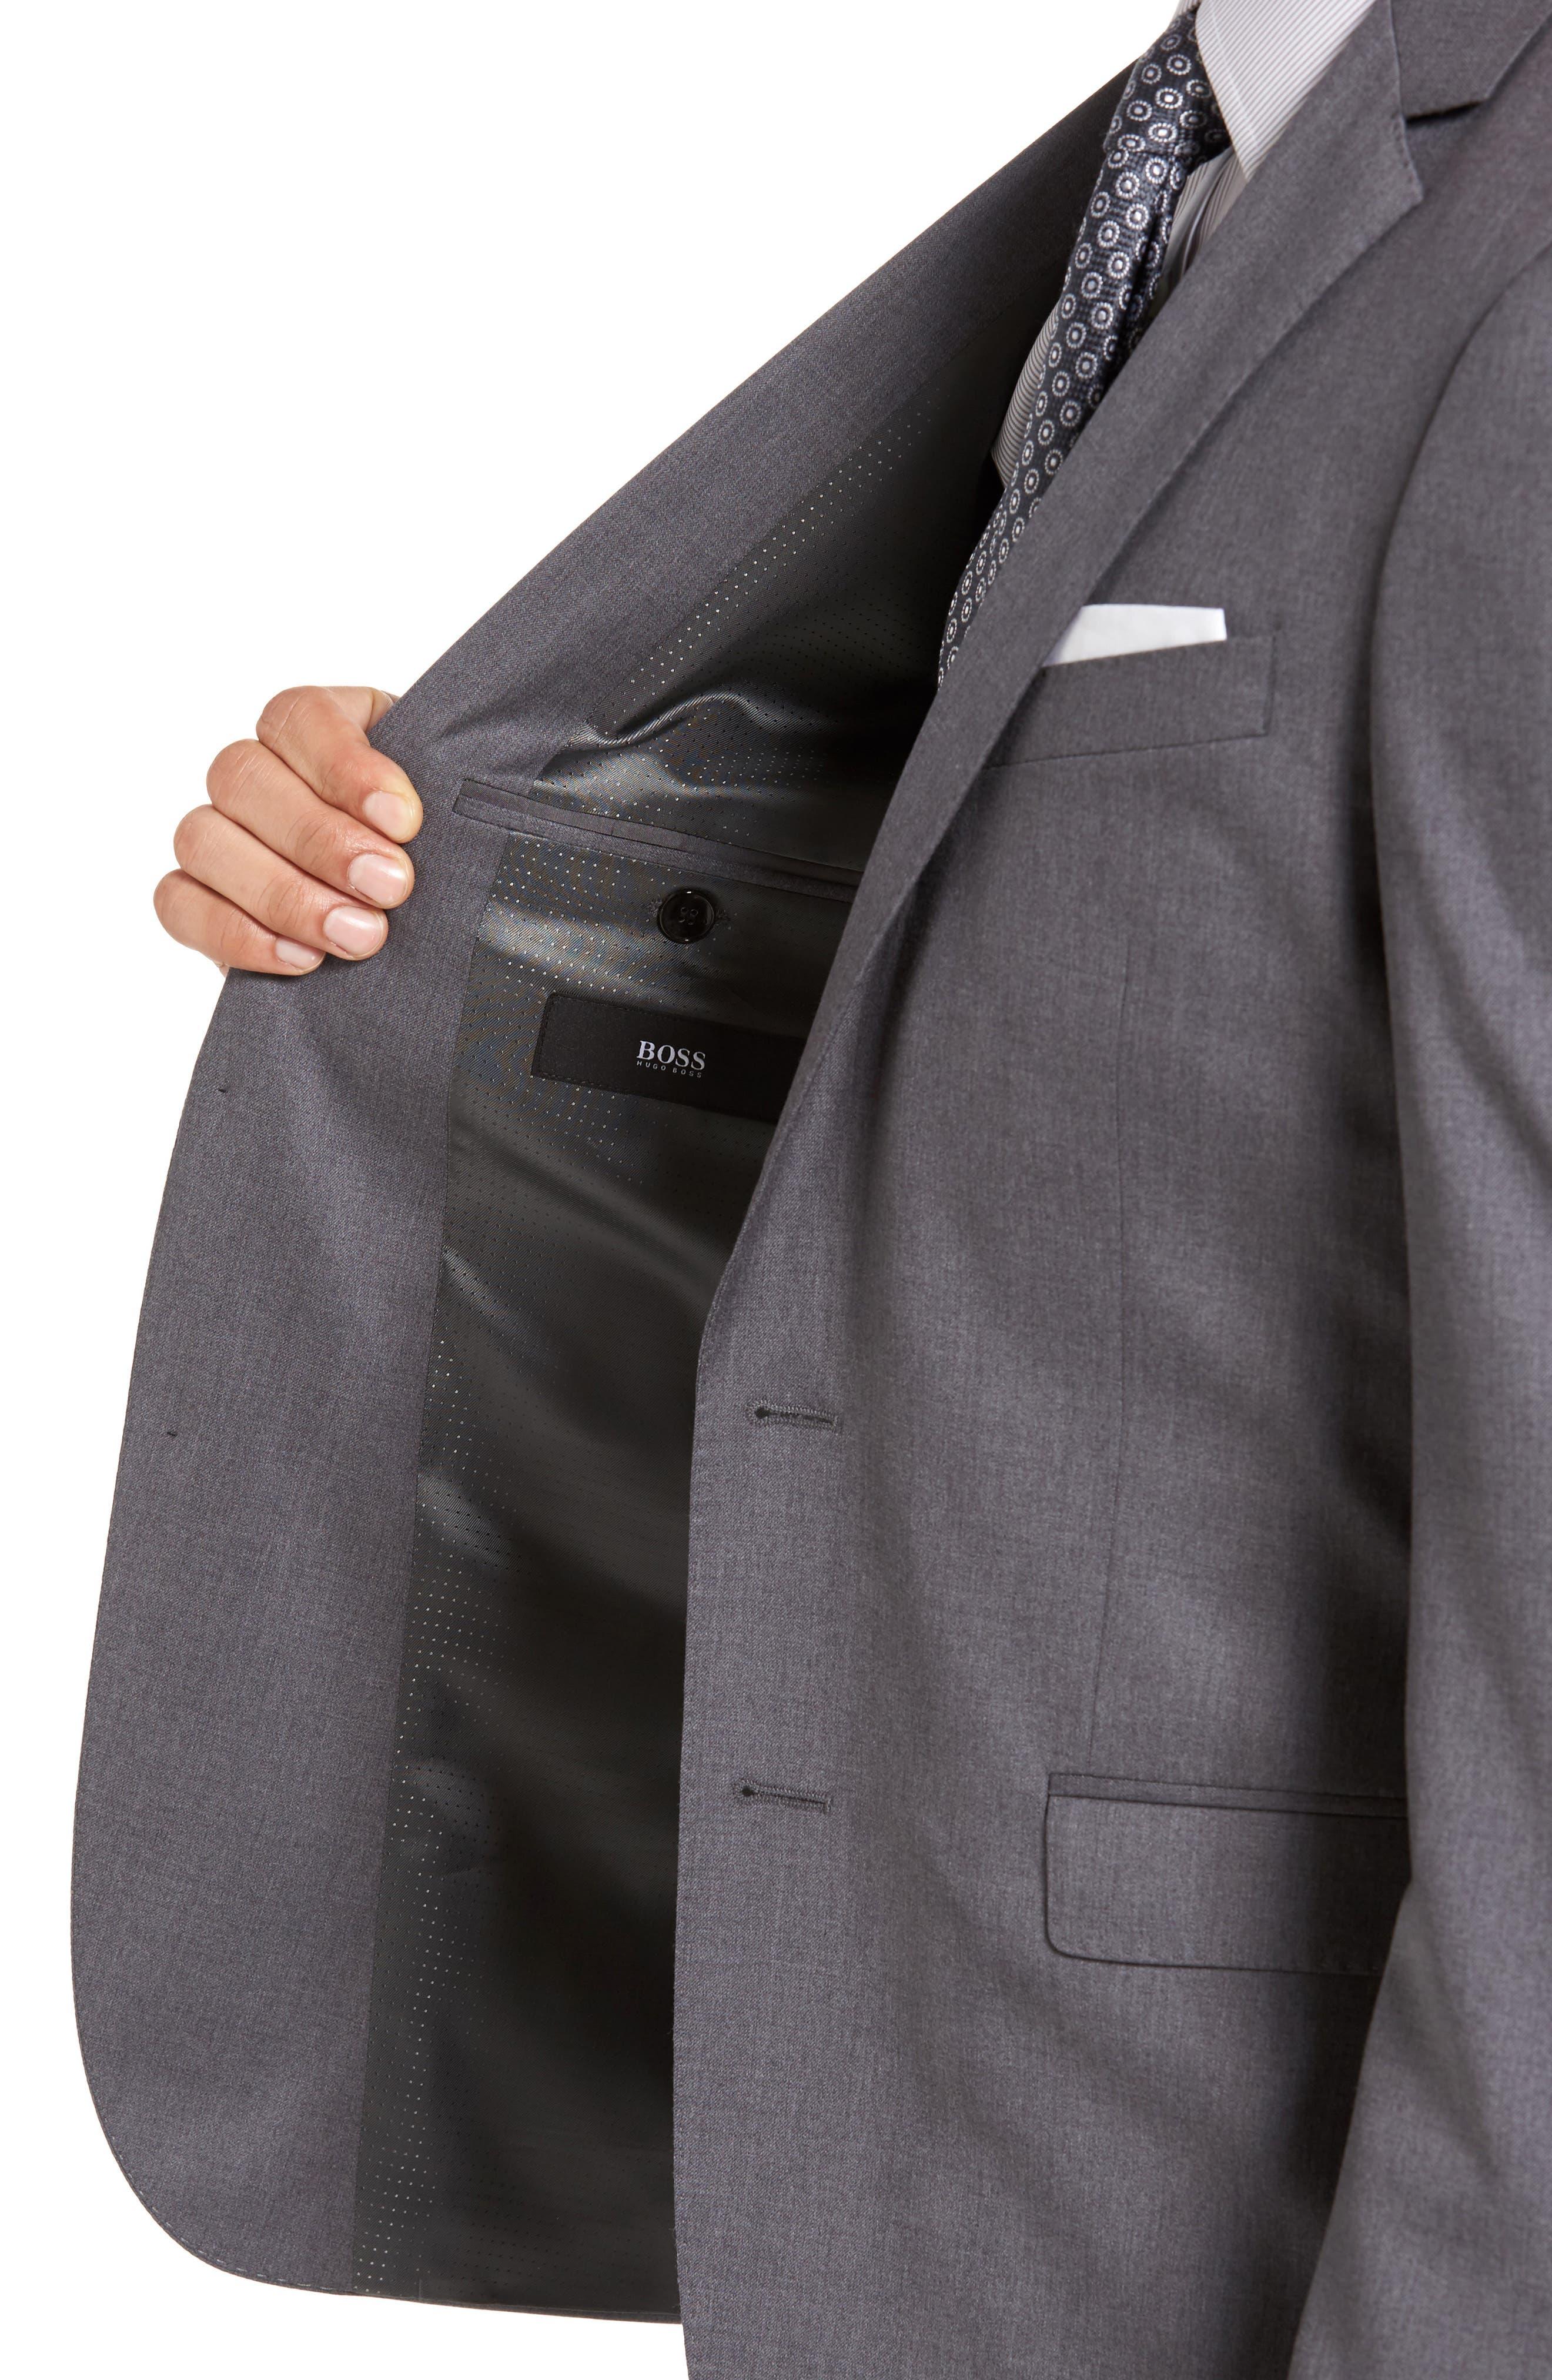 Ryan/Win Trim Fit Solid Wool Suit,                             Alternate thumbnail 5, color,                             Medium Grey